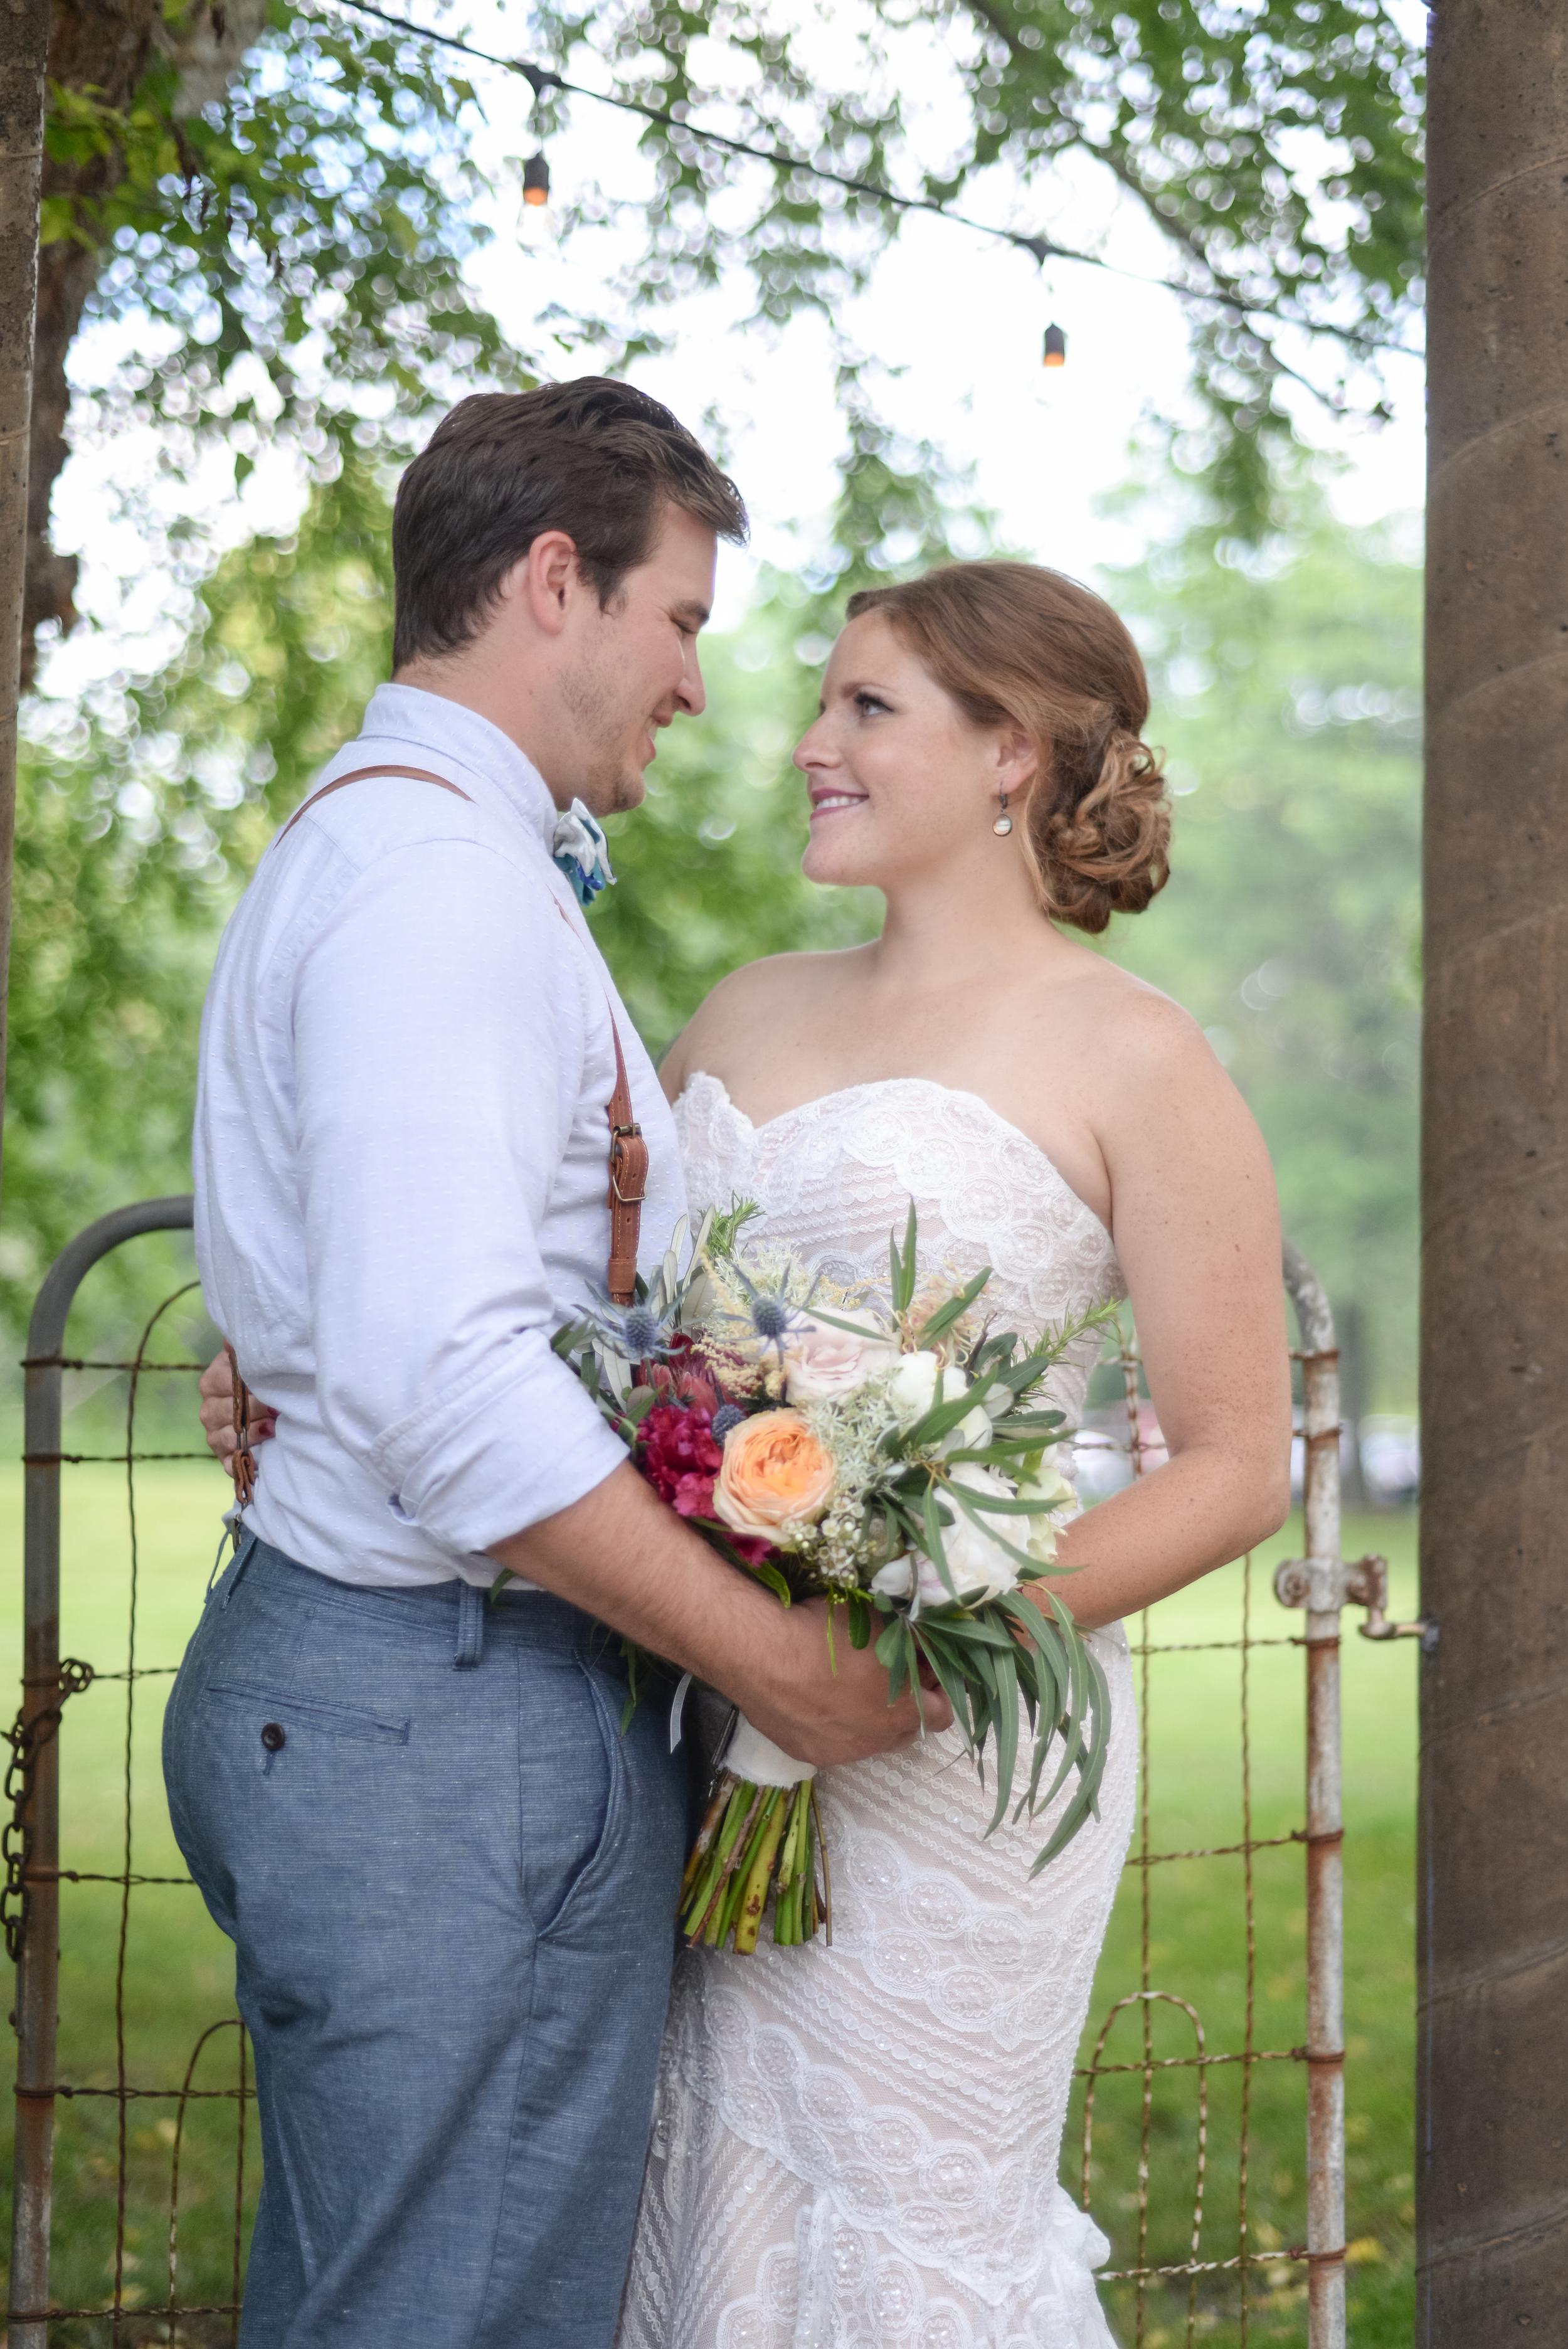 style altard st louis backyard wedding newlyweds